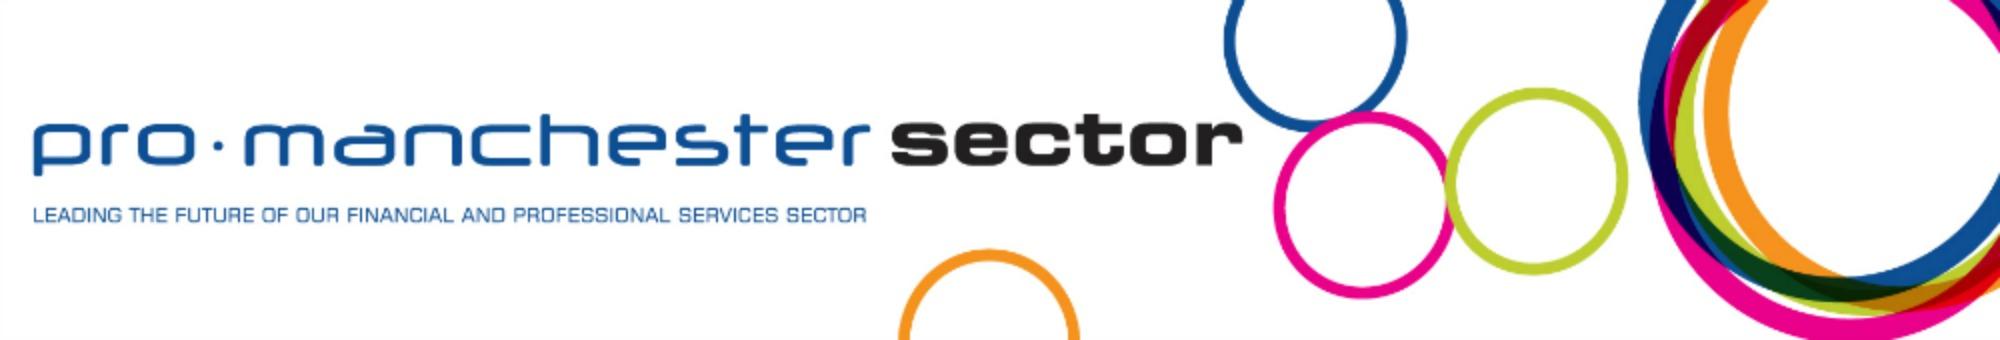 sector header 2000 px